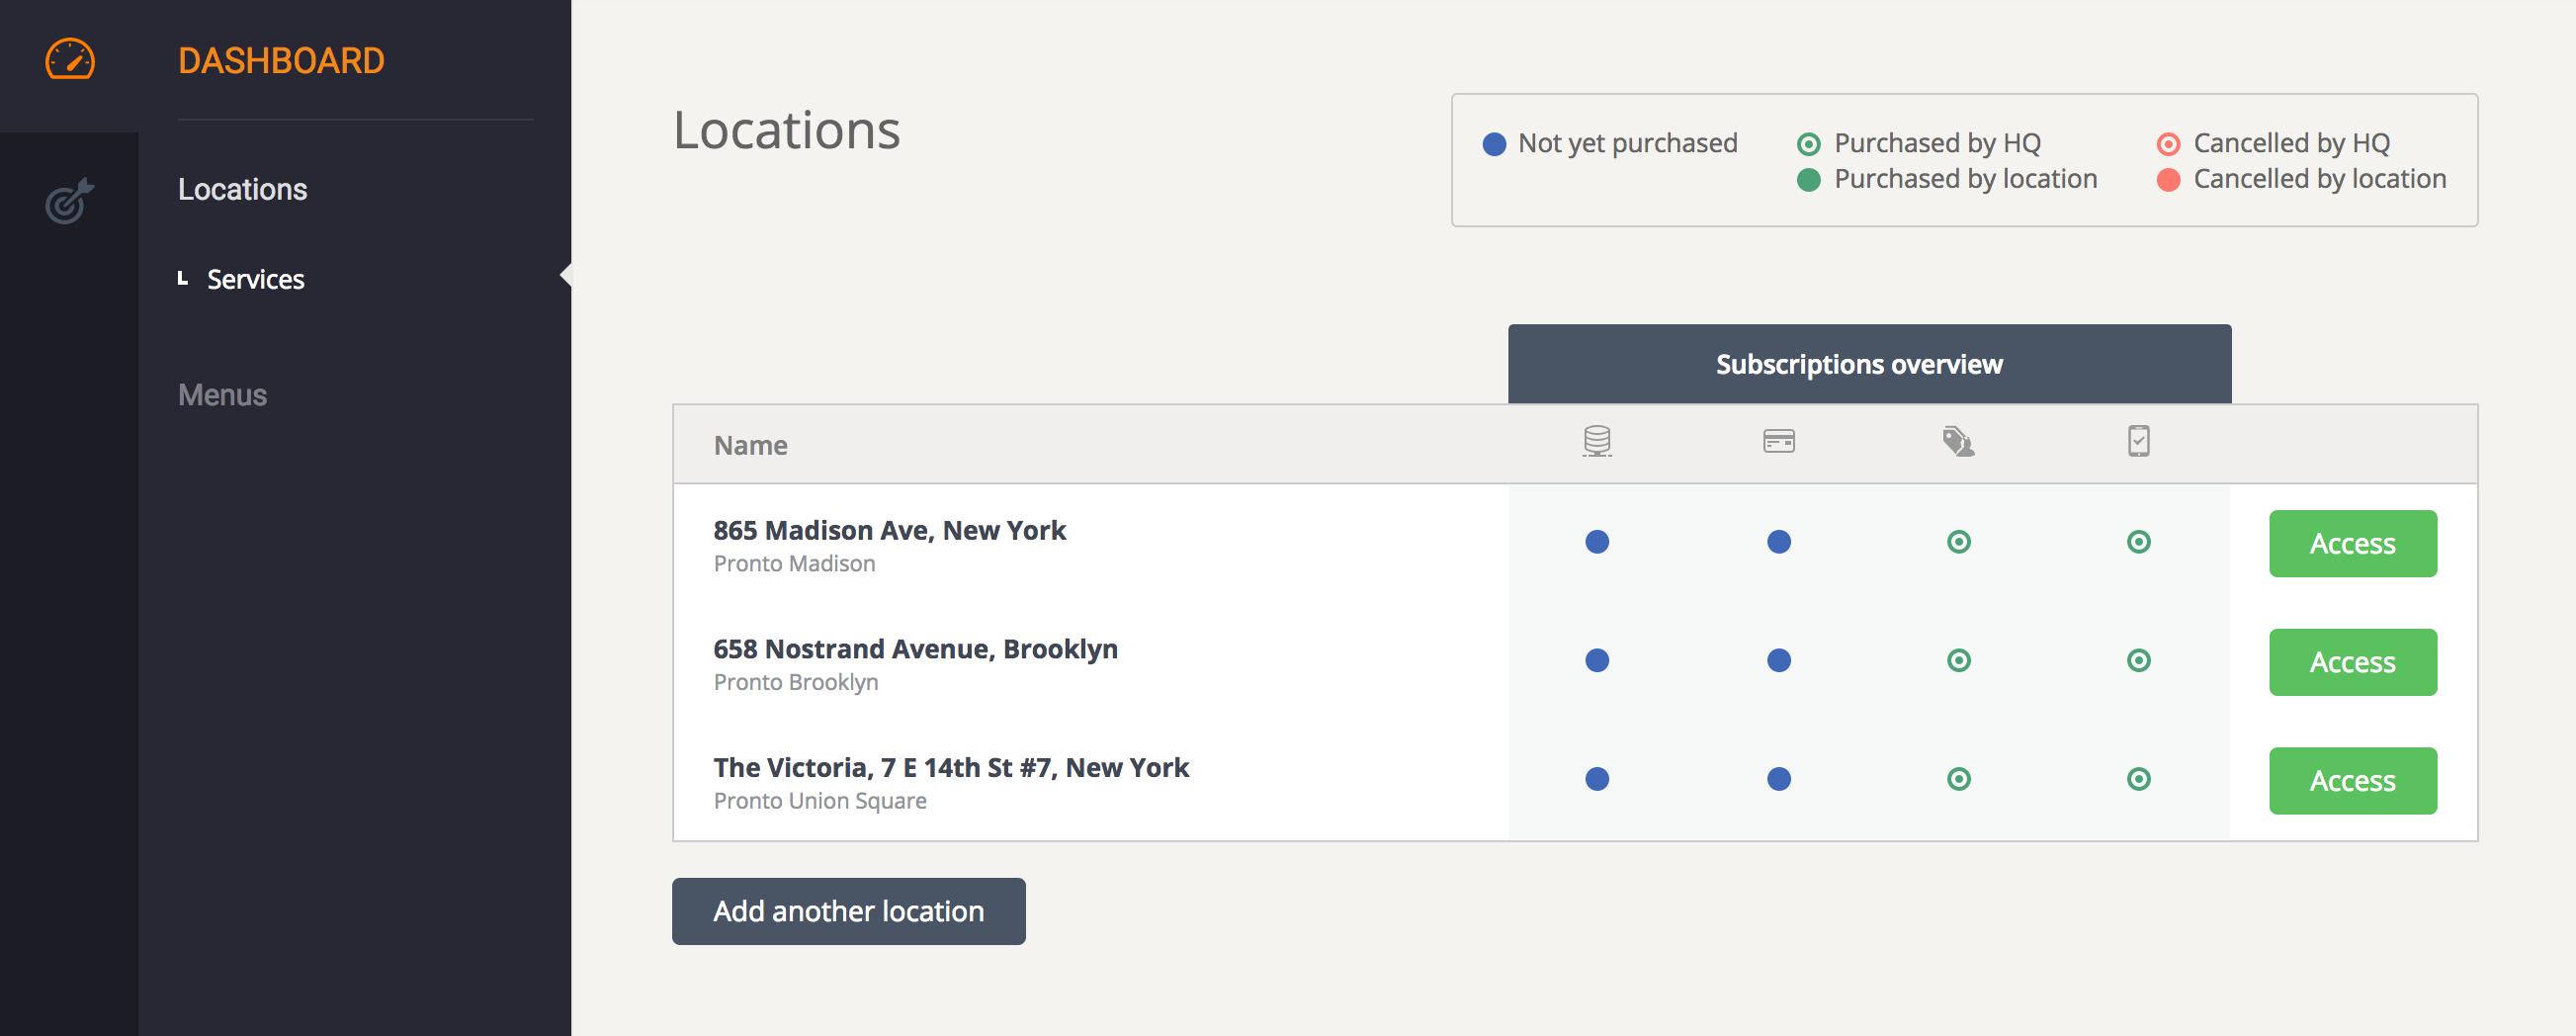 Online Ordering System For Multi Location Restaurants